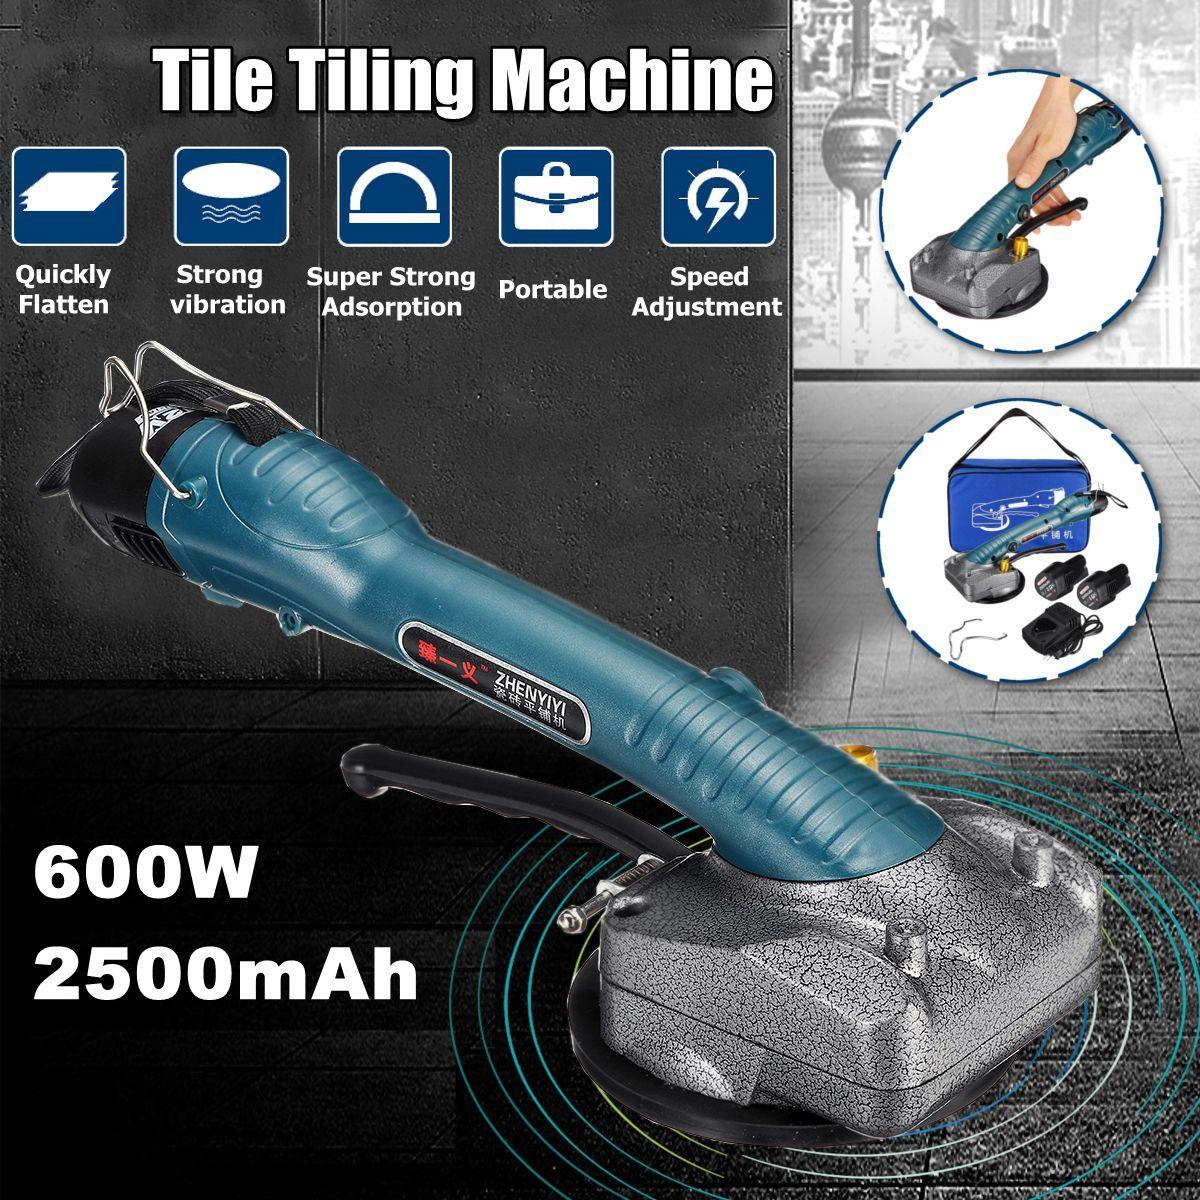 600W Machine Vibrators High Power Tiling  Electric Floor Tile Tool + 2x2500mAhBatteries